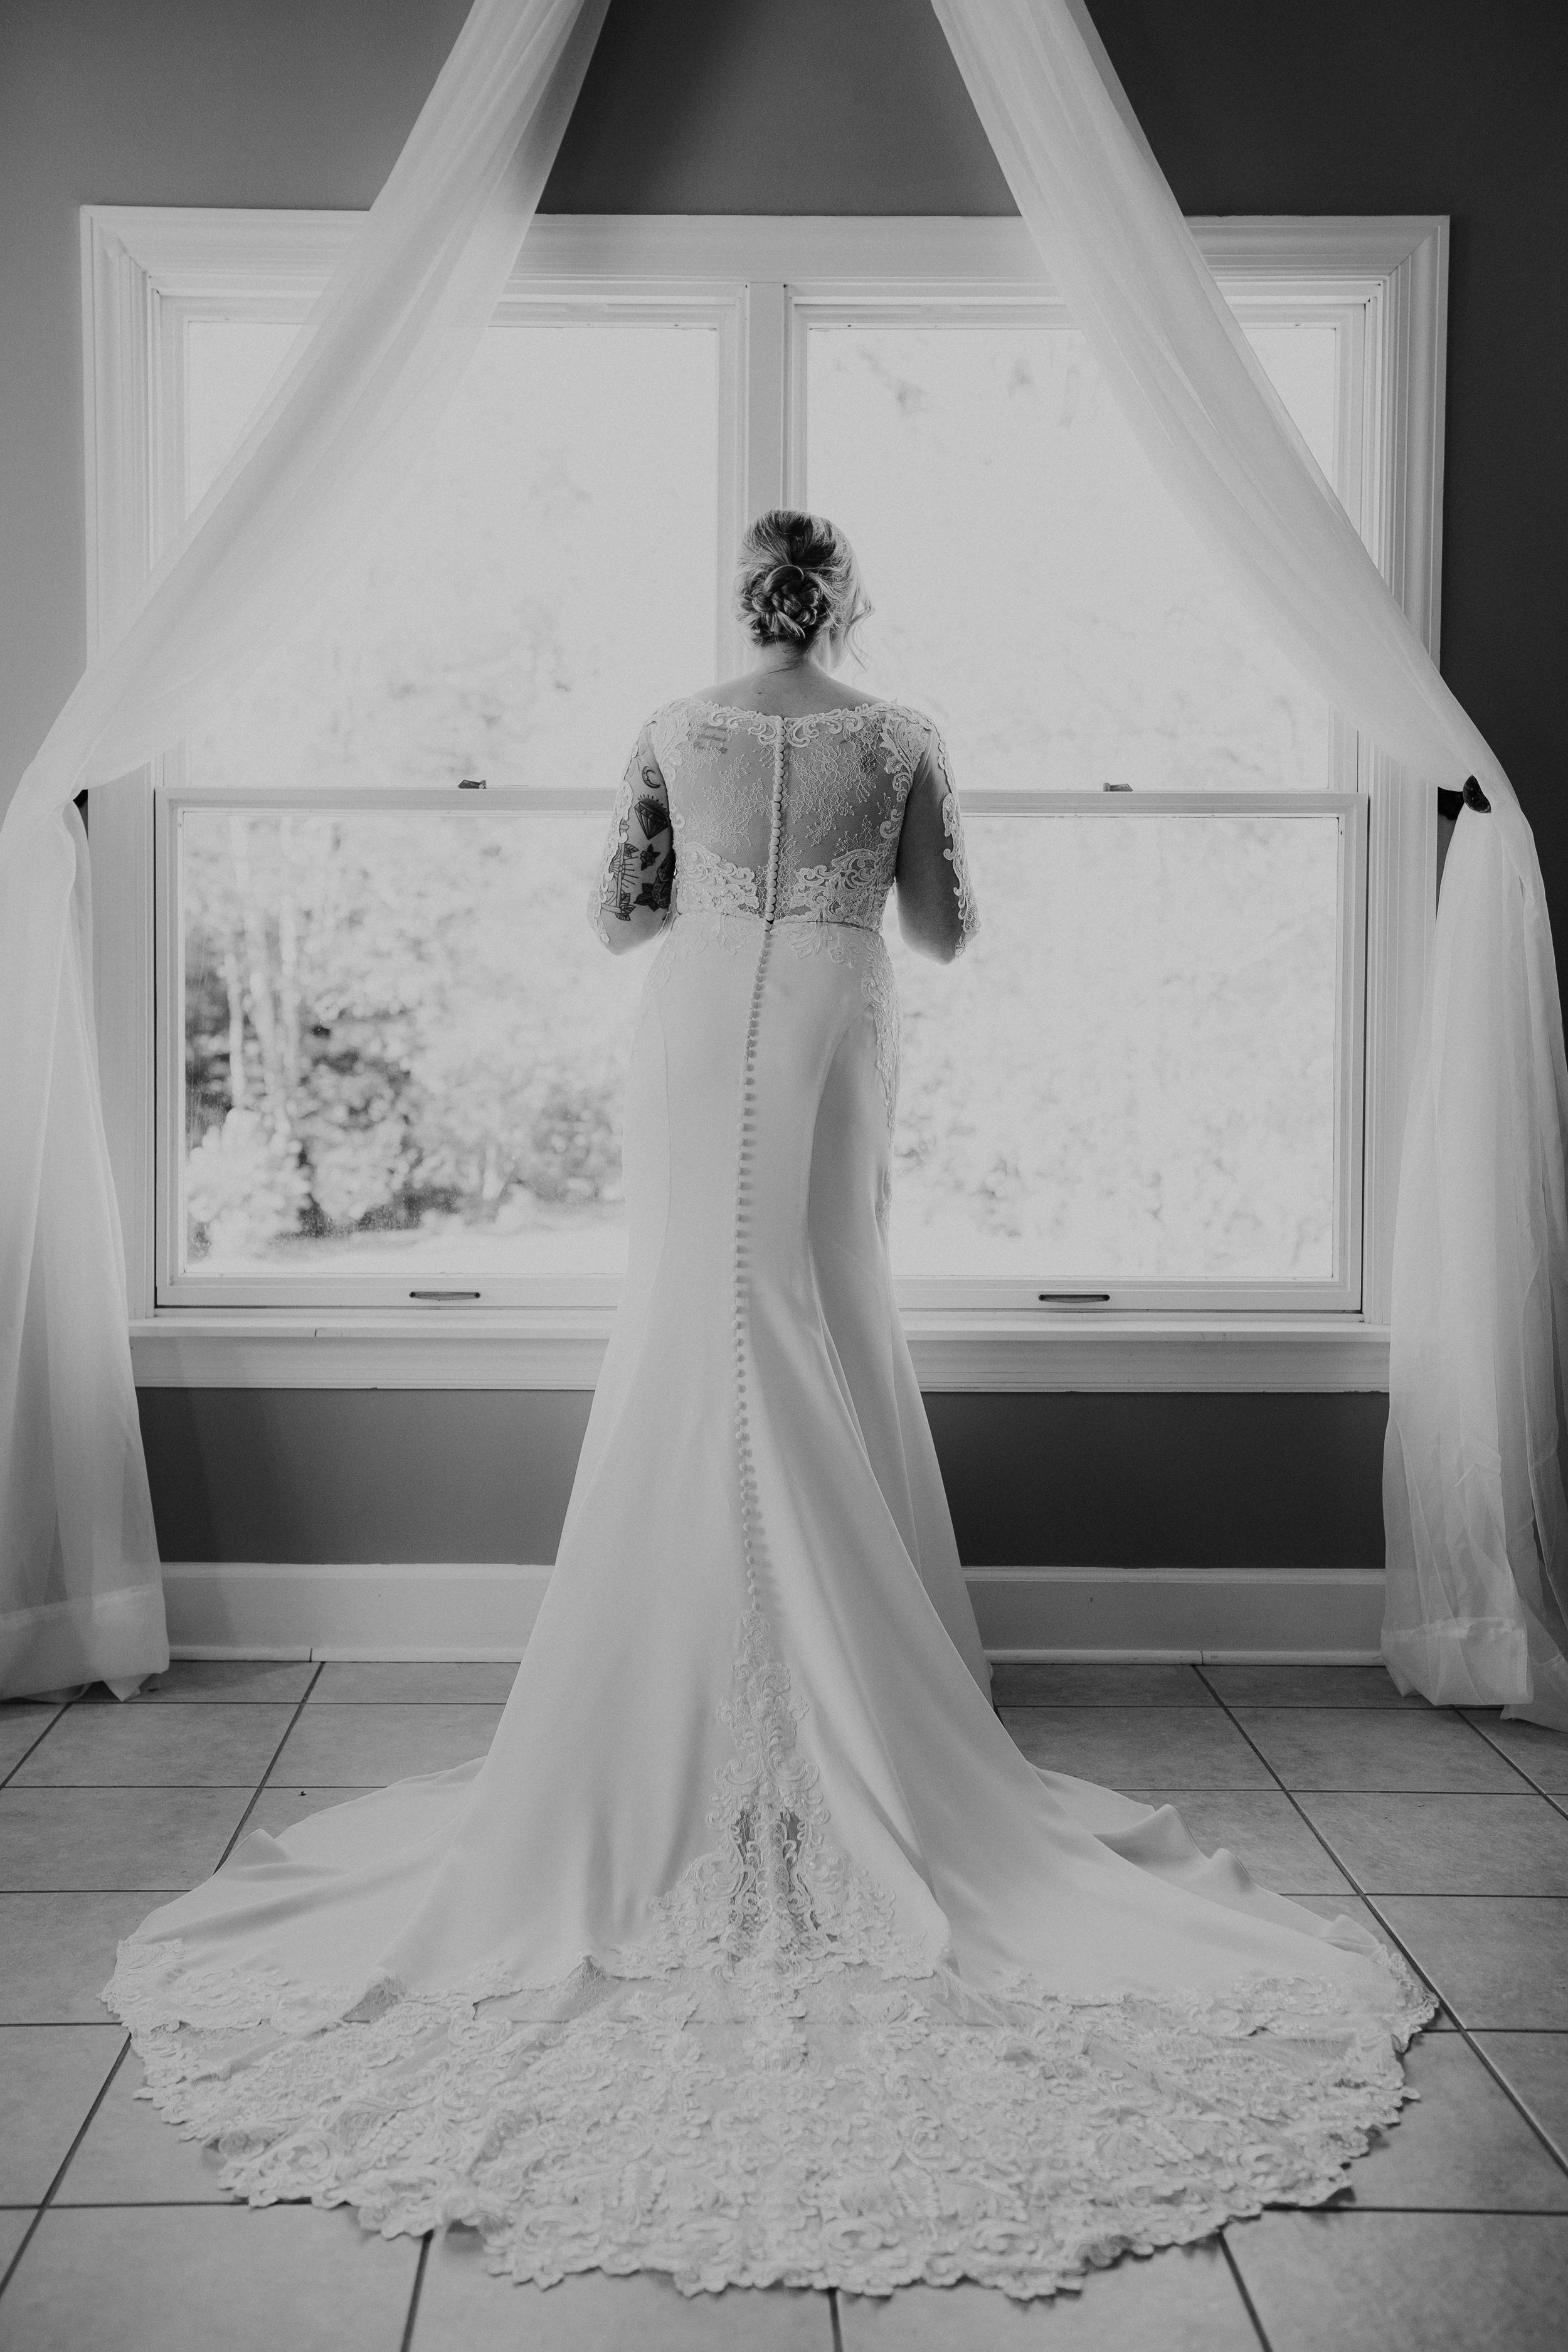 Gorgeous Wedding Dress Photos - Dara's Garden Knoxville East Tennessee Wedding — The Overwhelmed Bride Wedding Blog